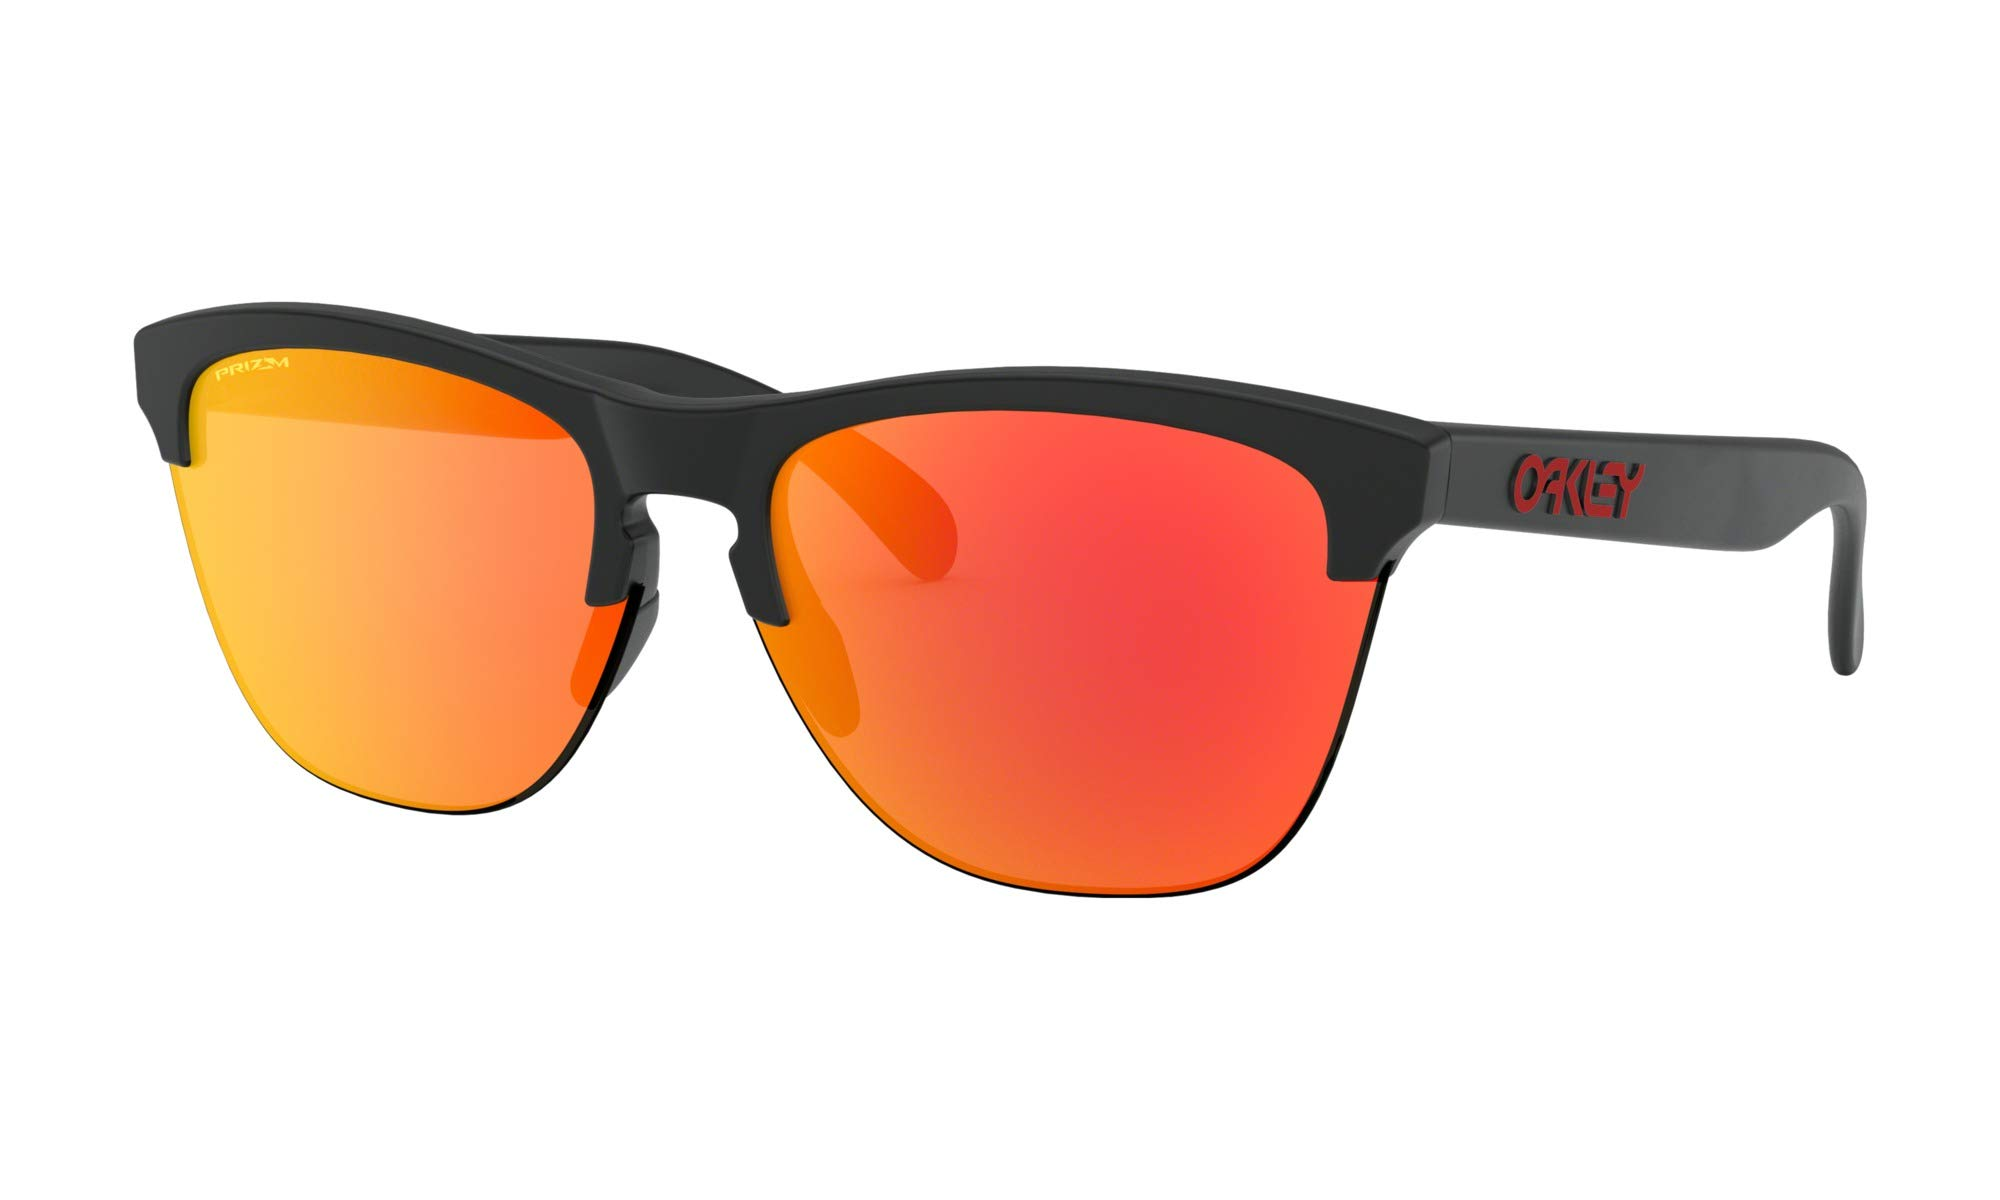 Oakley Frogskins Lite Sunglasses Matte Black with Prizm Ruby Lens + Sticker by Oakley